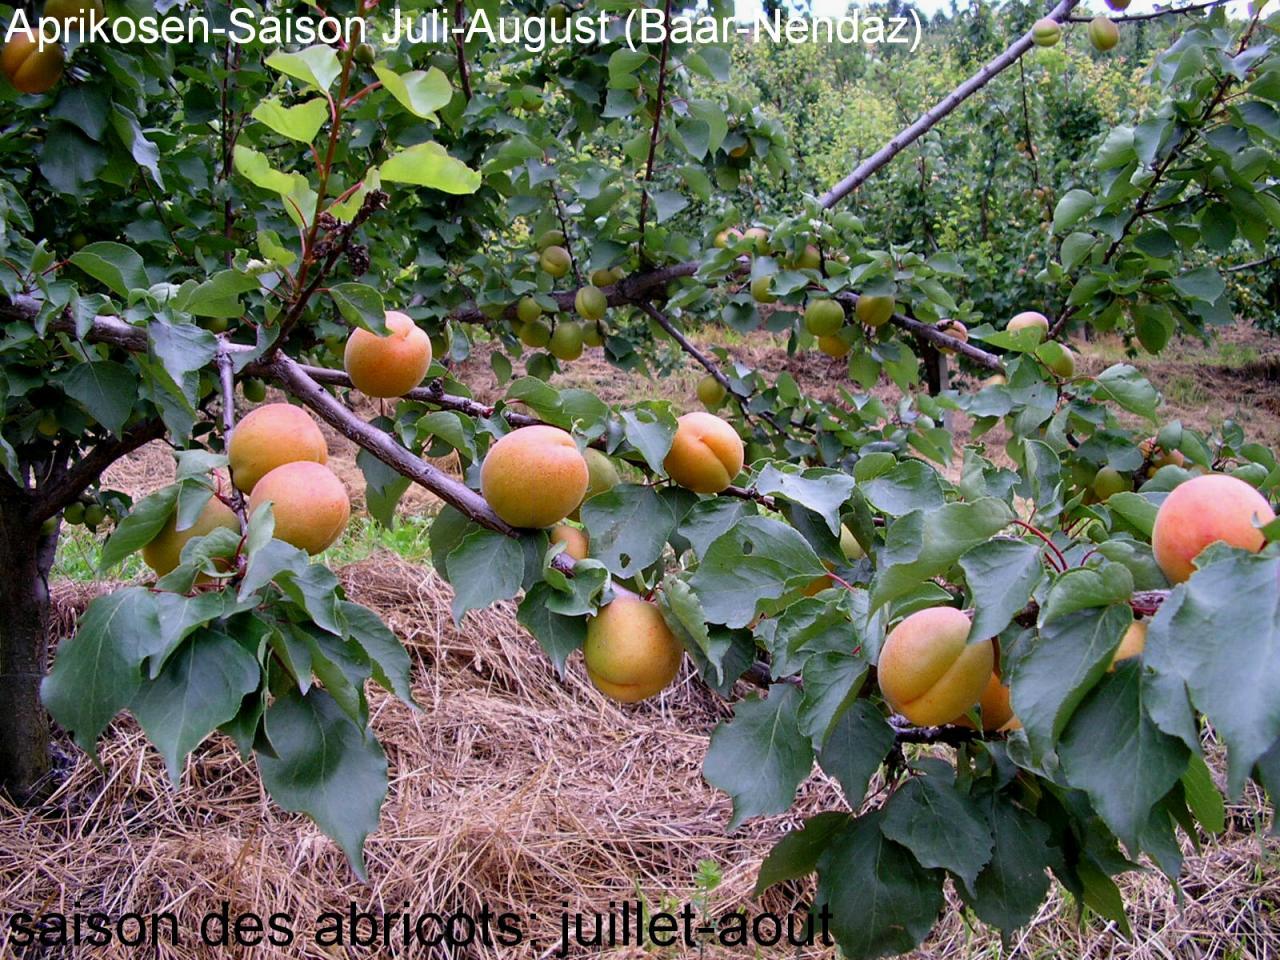 Abricots / Aprikosen